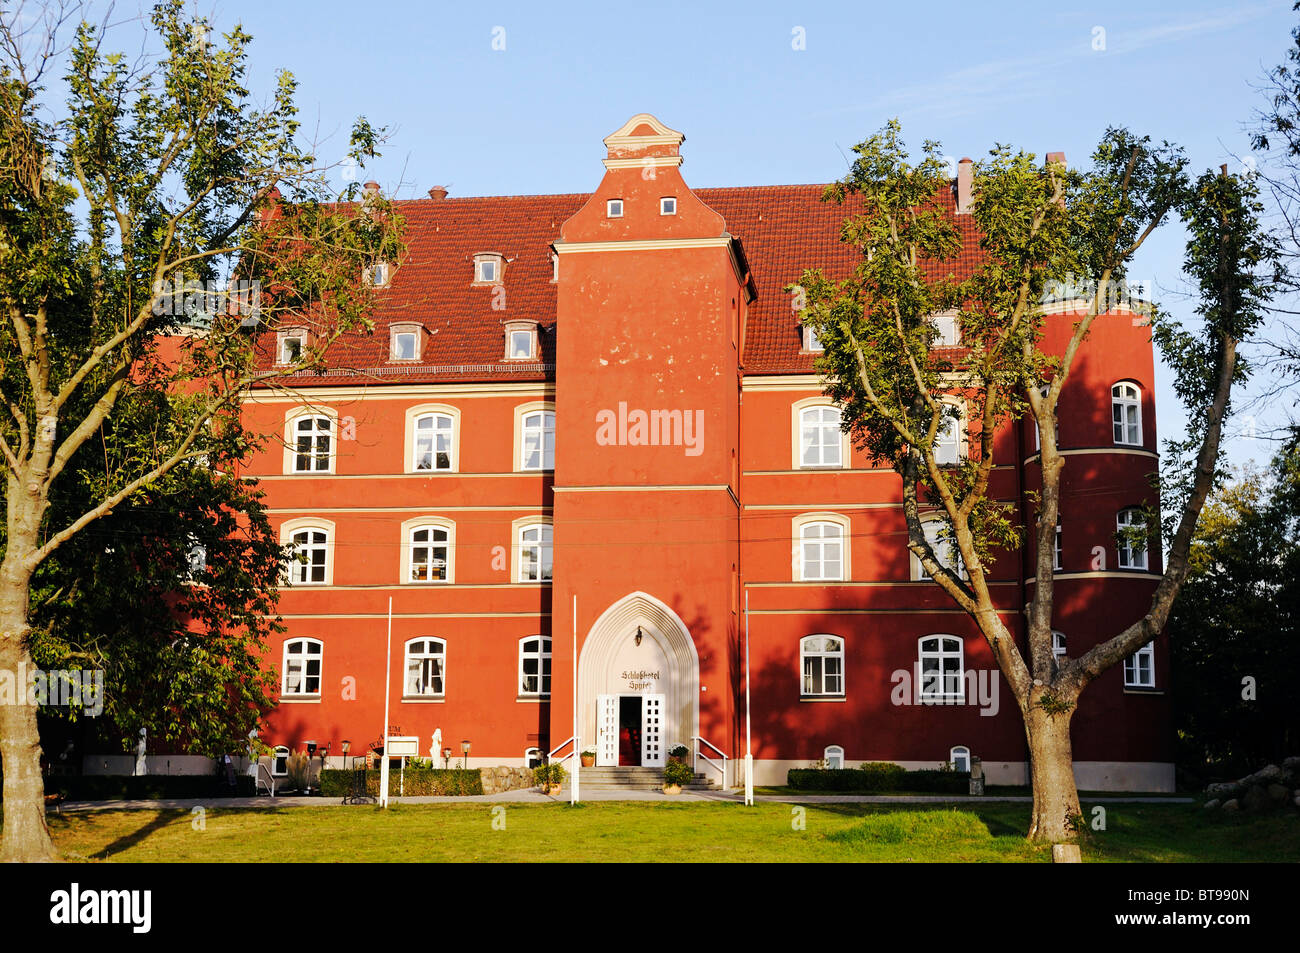 Hotel Schloss Spyker, Renaissance-style, Bobbin village, Jasmund peninsula, Ruegen Island, Mecklenburg-Western Pomerania - Stock Image